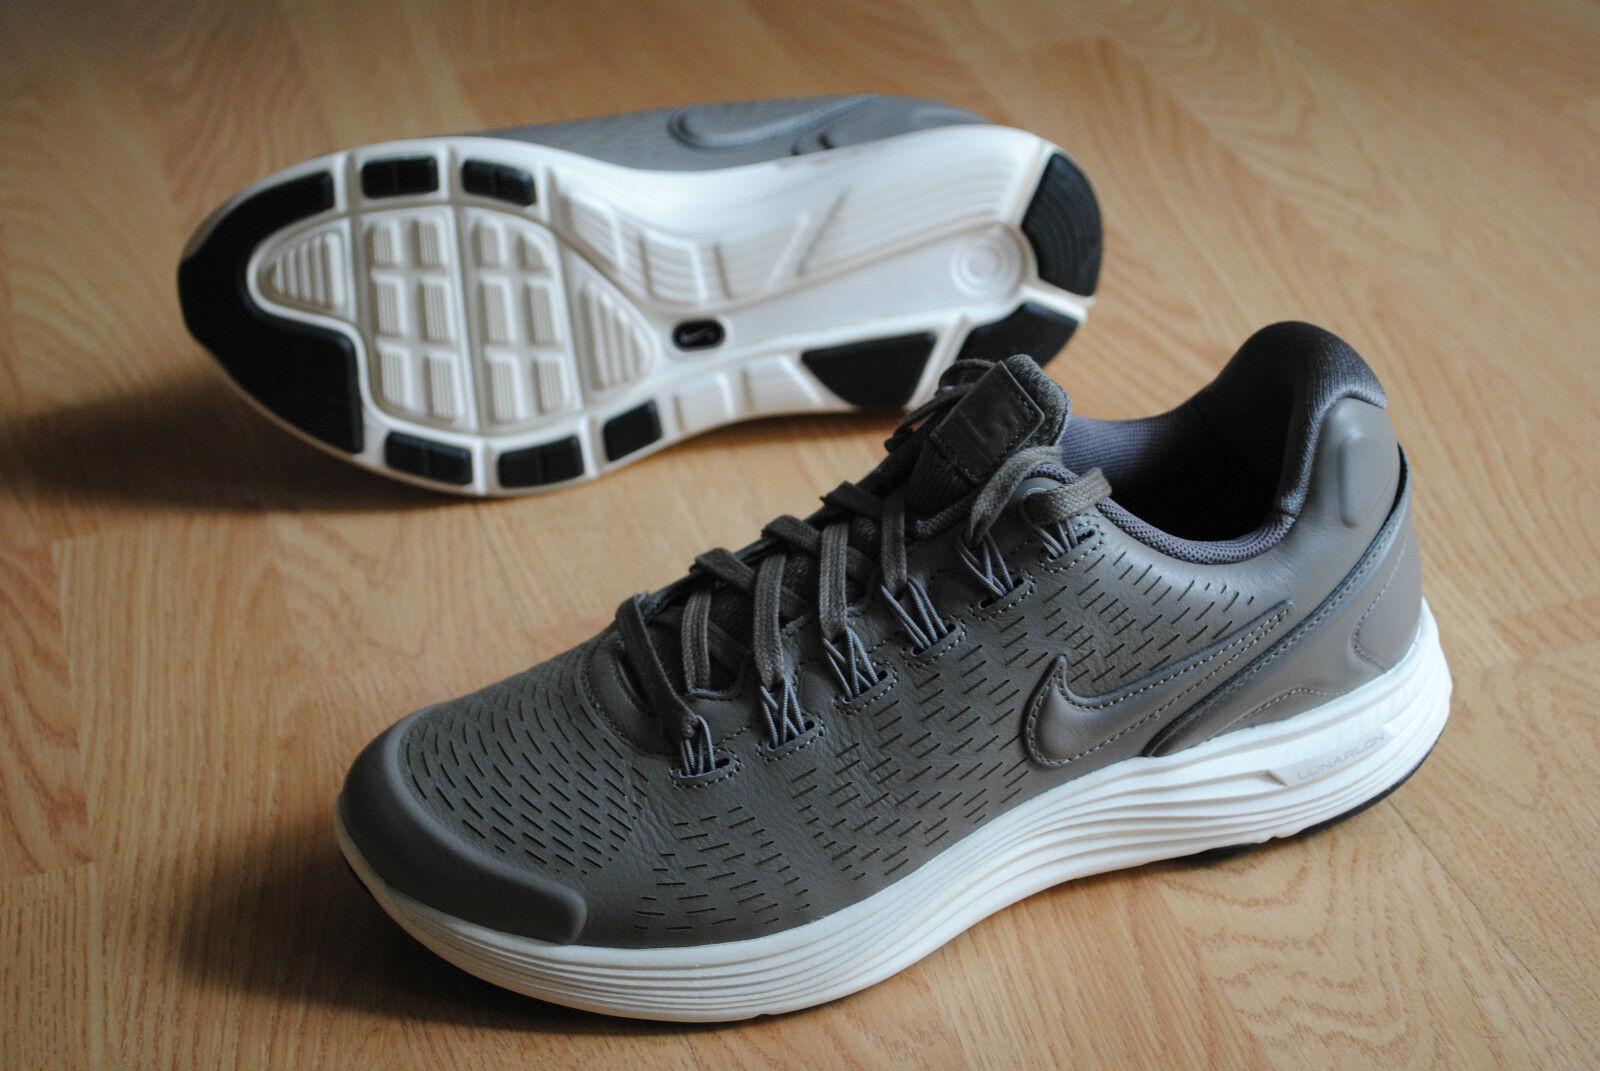 Nike Lunarglide+ 40 41 42 42,5 Zapatillas de correr Piel PEGASO Free lunarepic Seasonal clearance sale